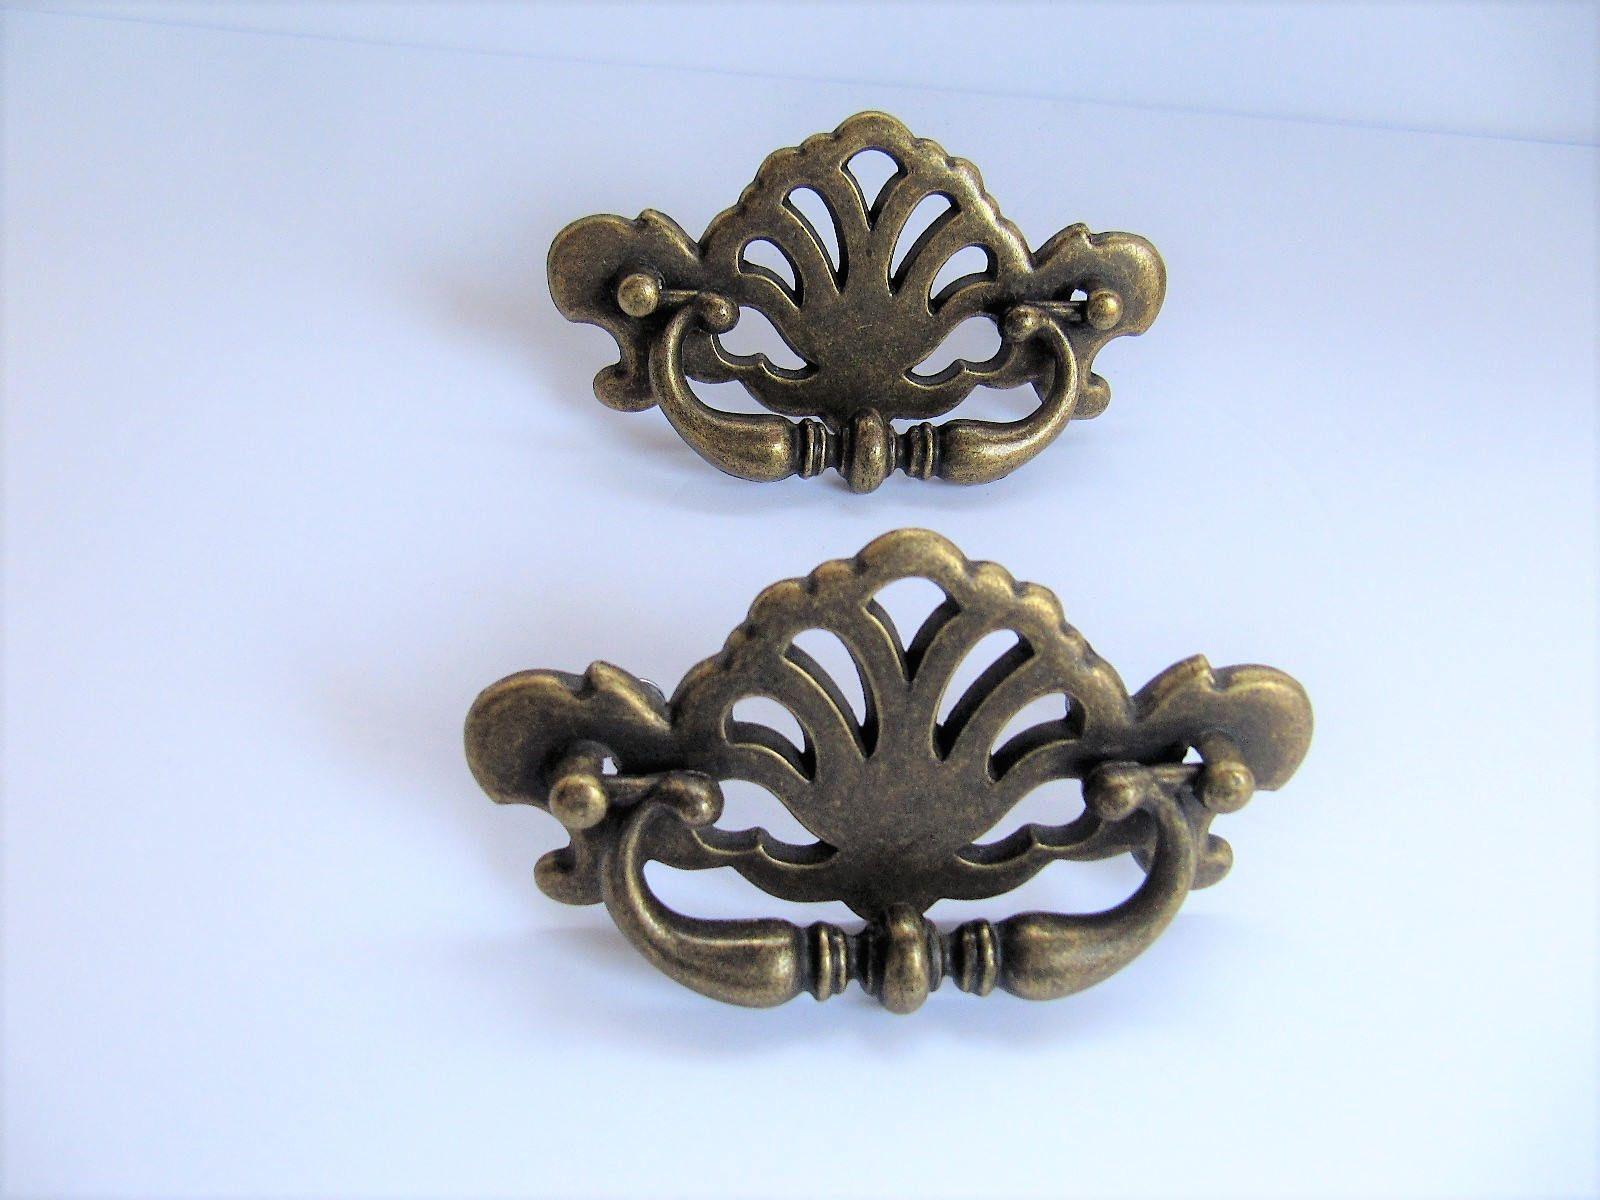 Vintage Drawer Pulls Pair Of Bronze Pulls Diy Reclaimed Hardware